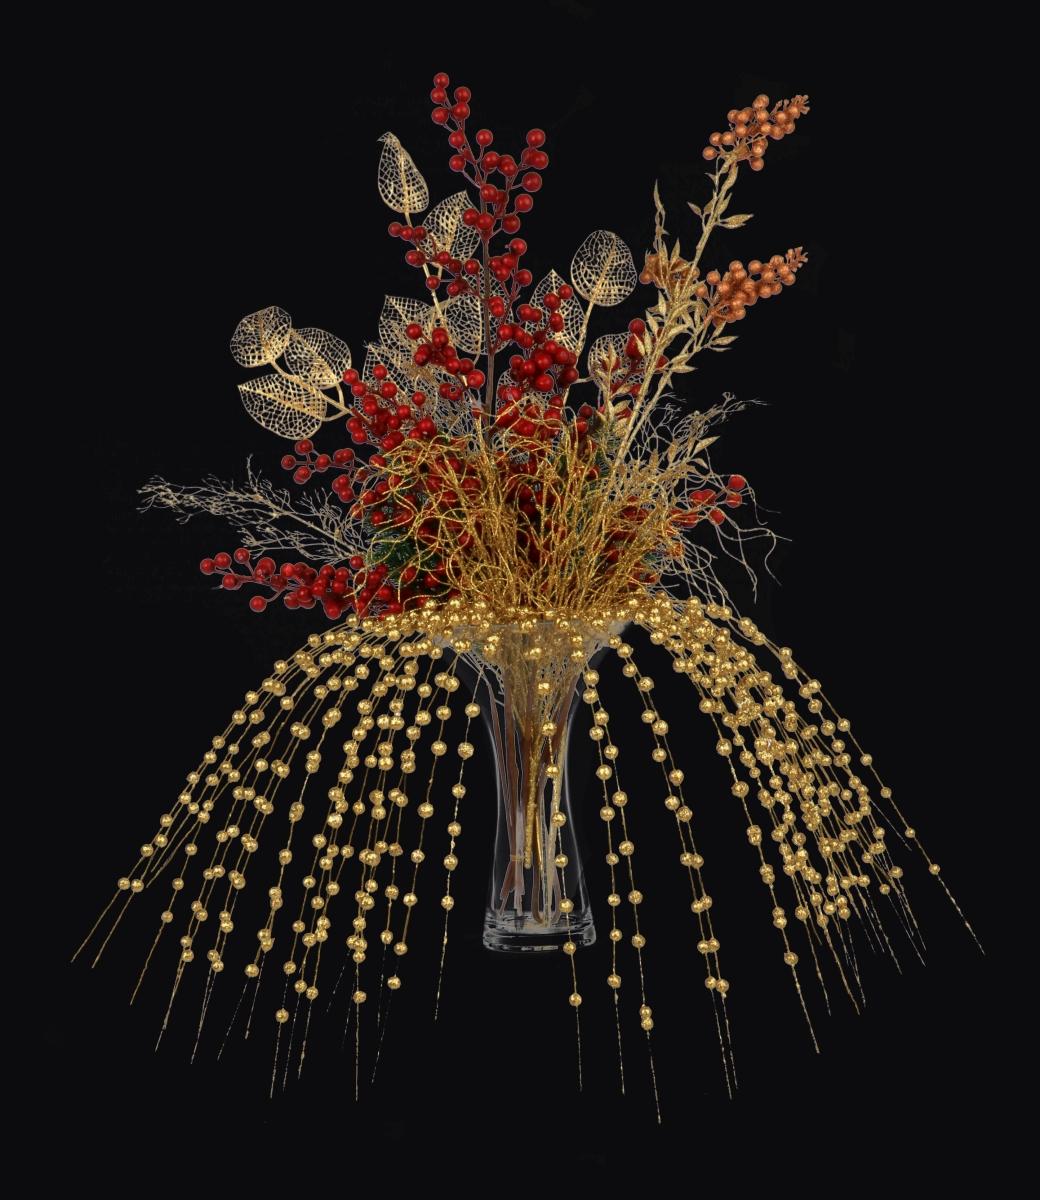 DA985622-3 dielna ratolesť s listami lipy, zlatá dĺžka cca 70 cm